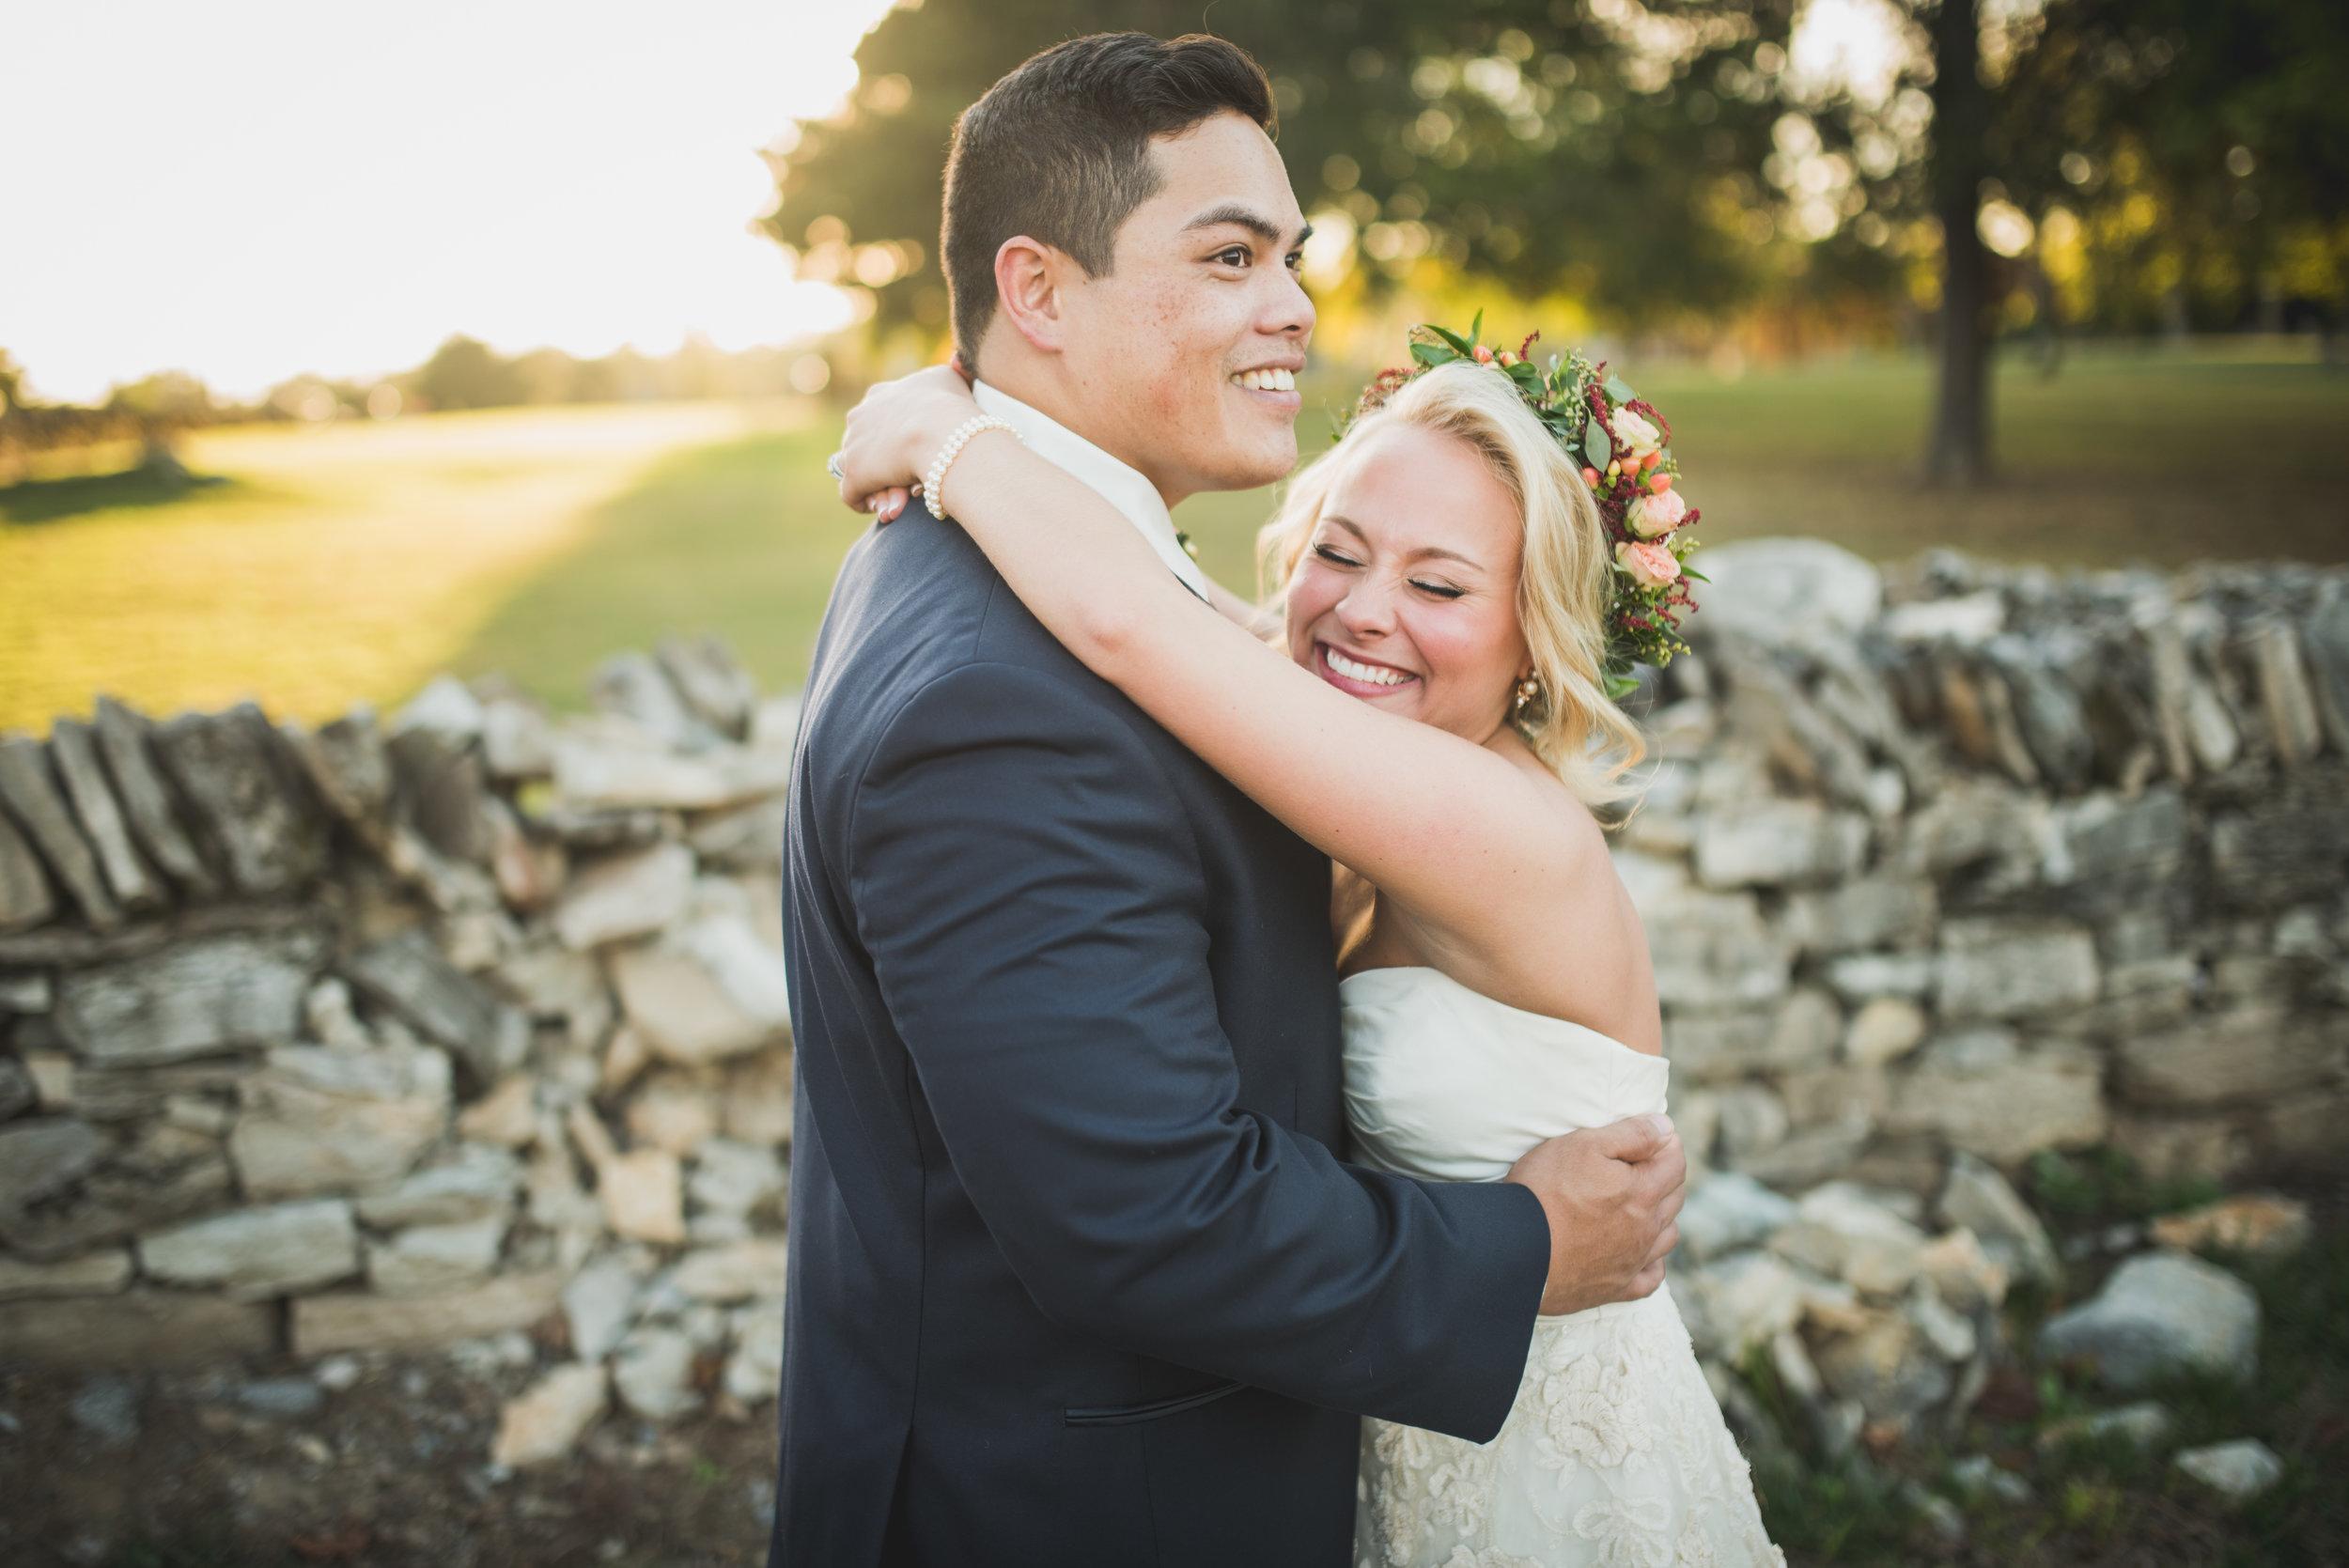 Nashville-wedding-photographers-CJ's-Off-The-Square-46.JPG